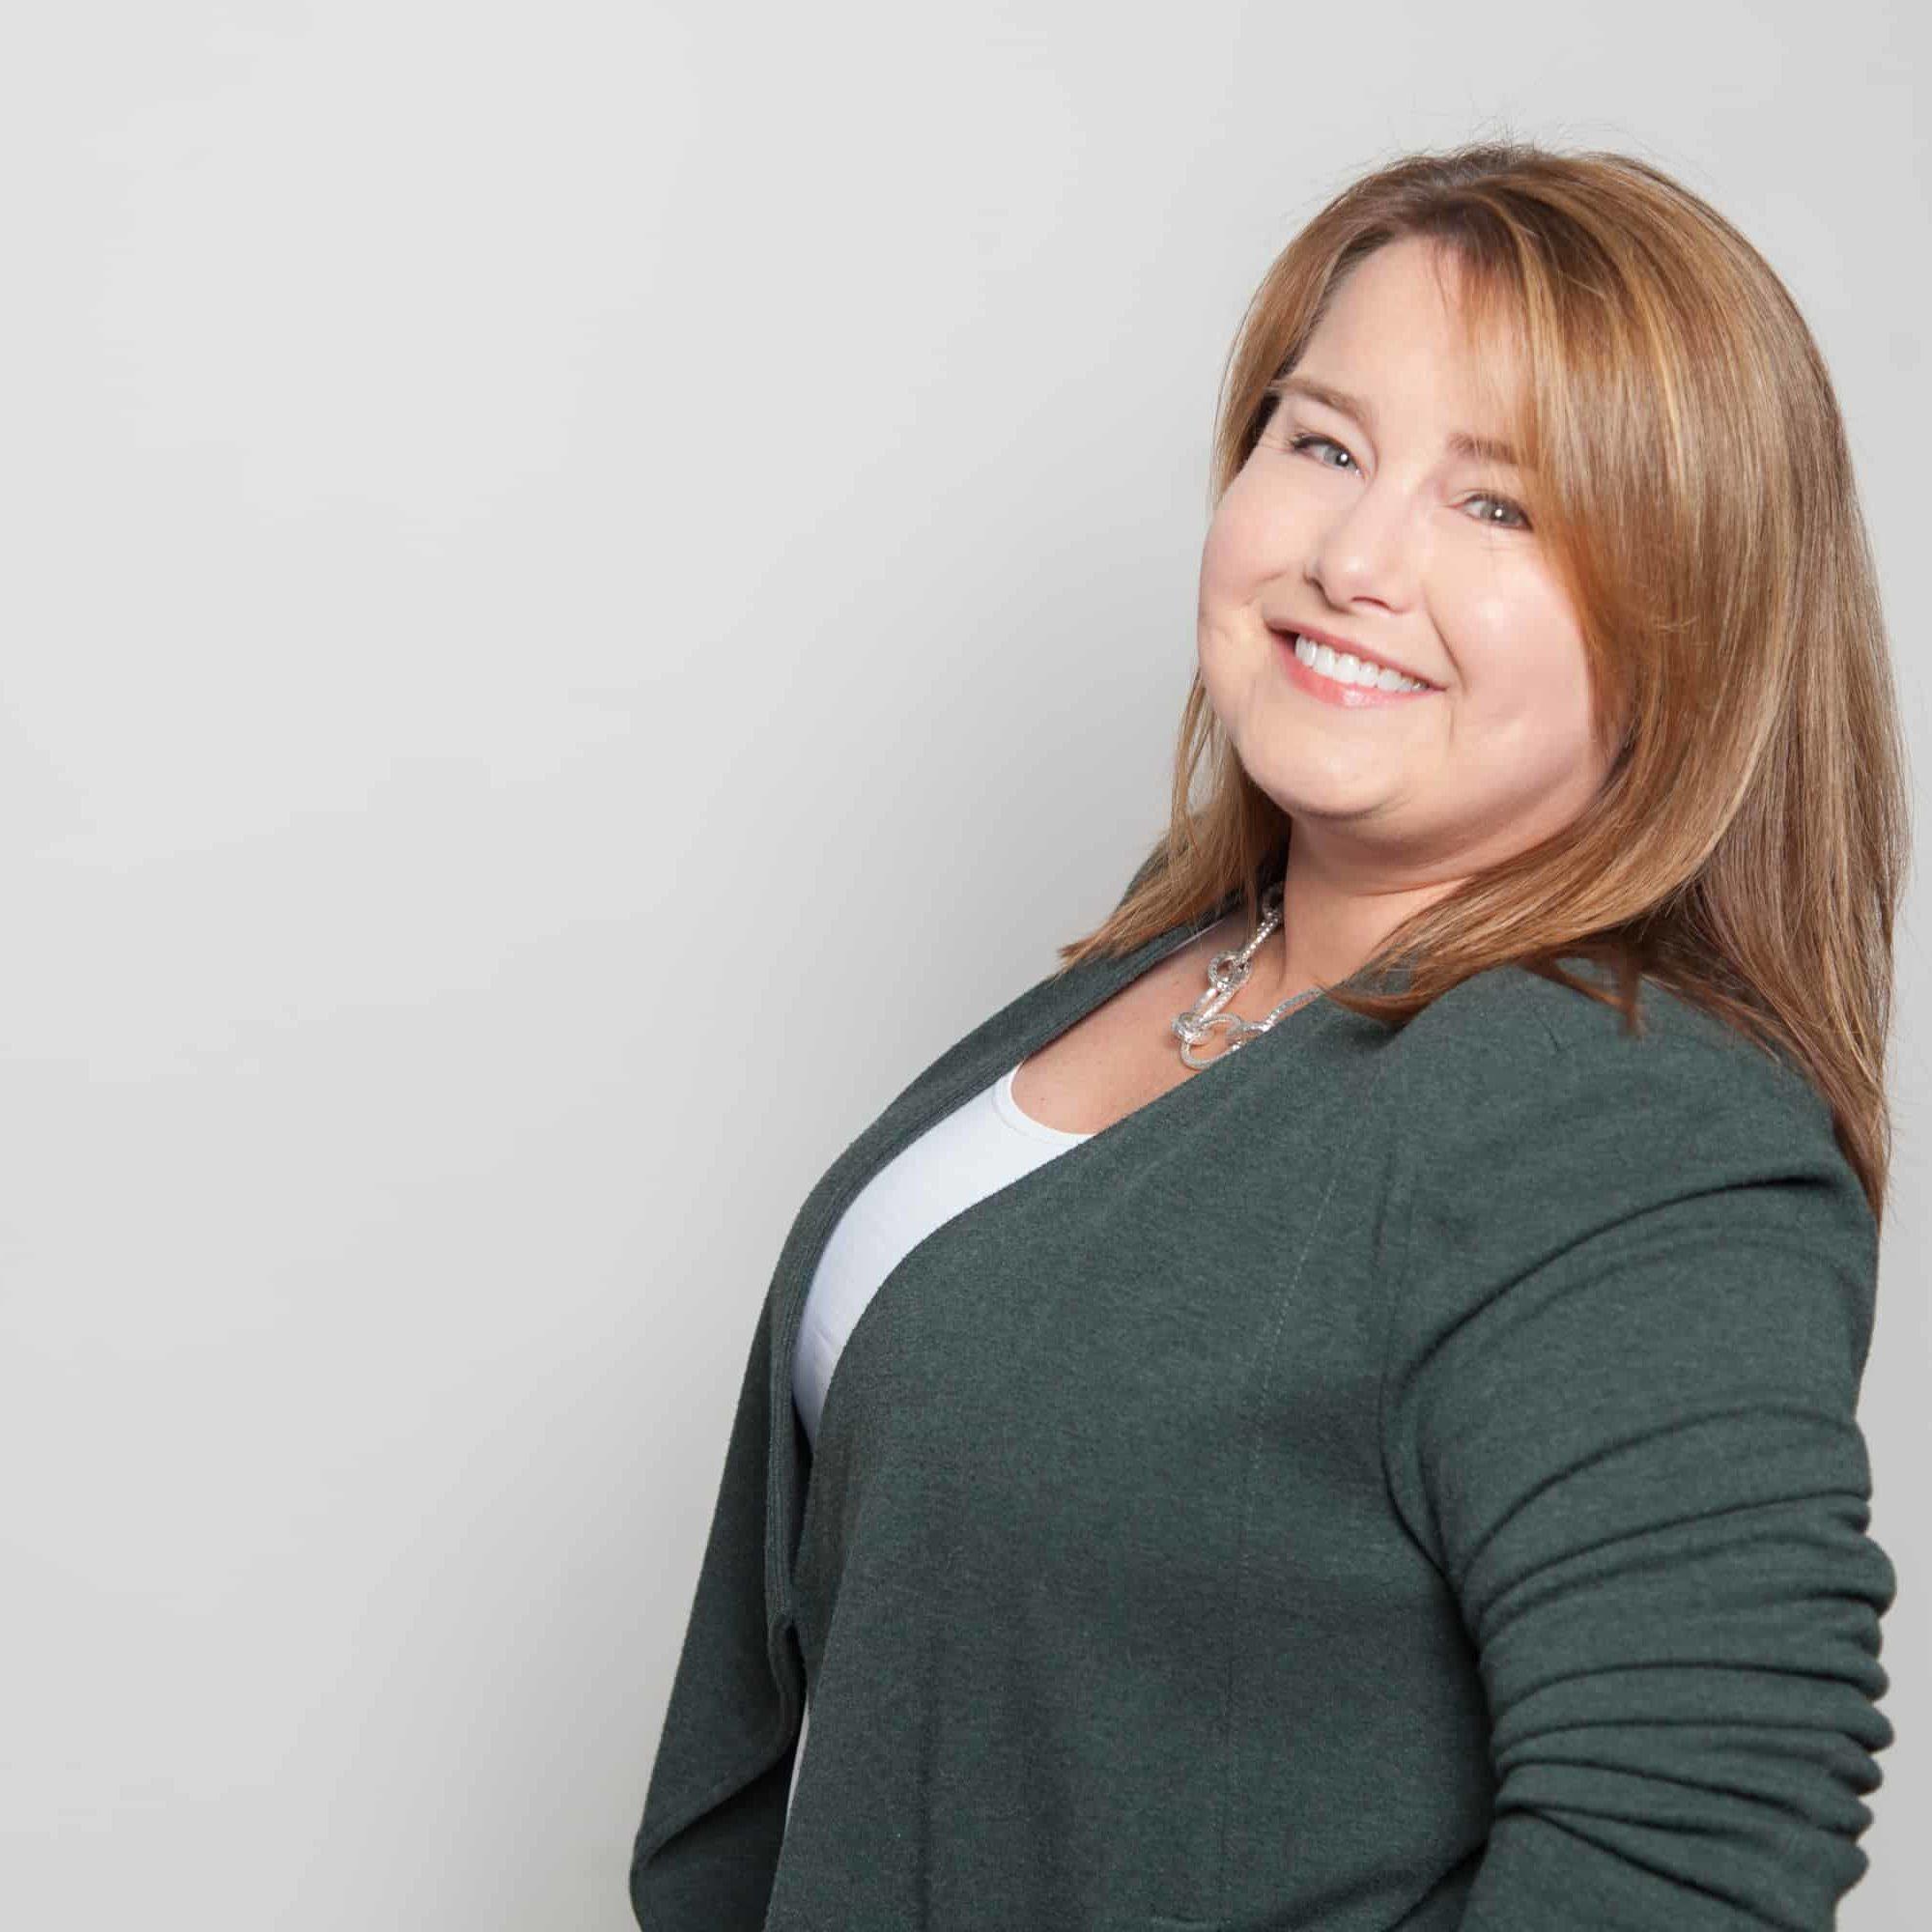 Michelle Desrosiers